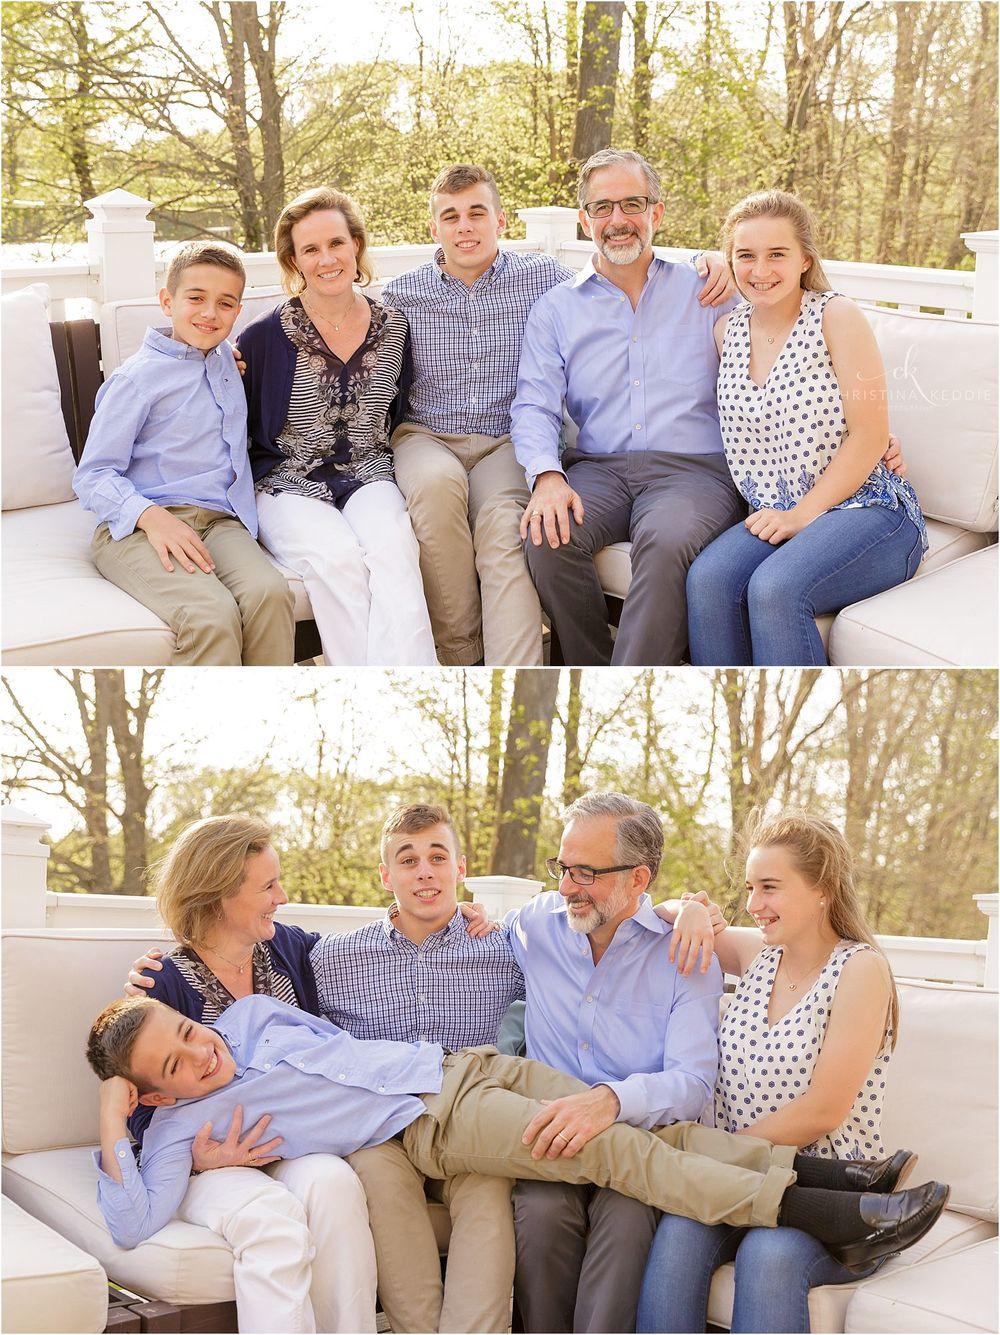 Family portraits on patio overlooking lake | Christina Keddie Photography | Skillman NJ family photographer